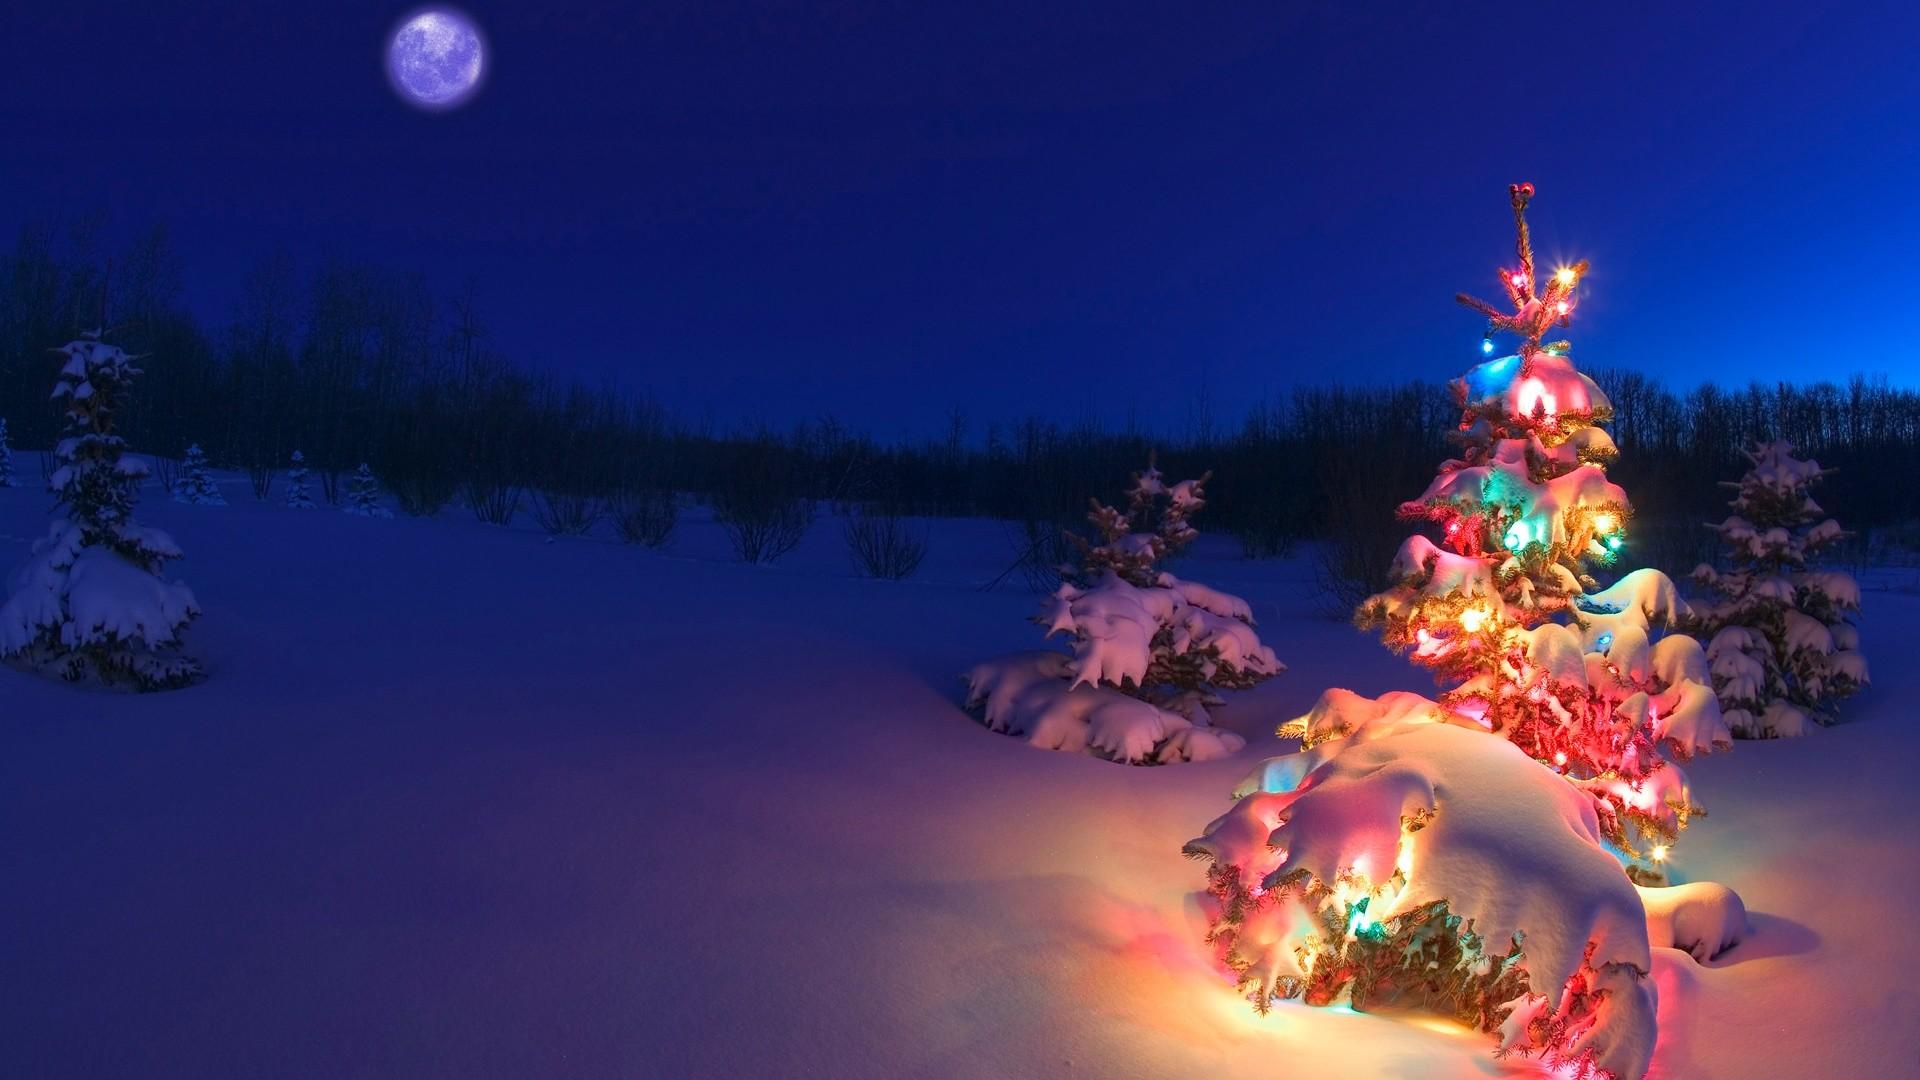 happy christmas-wallpaper-hd-widescreen